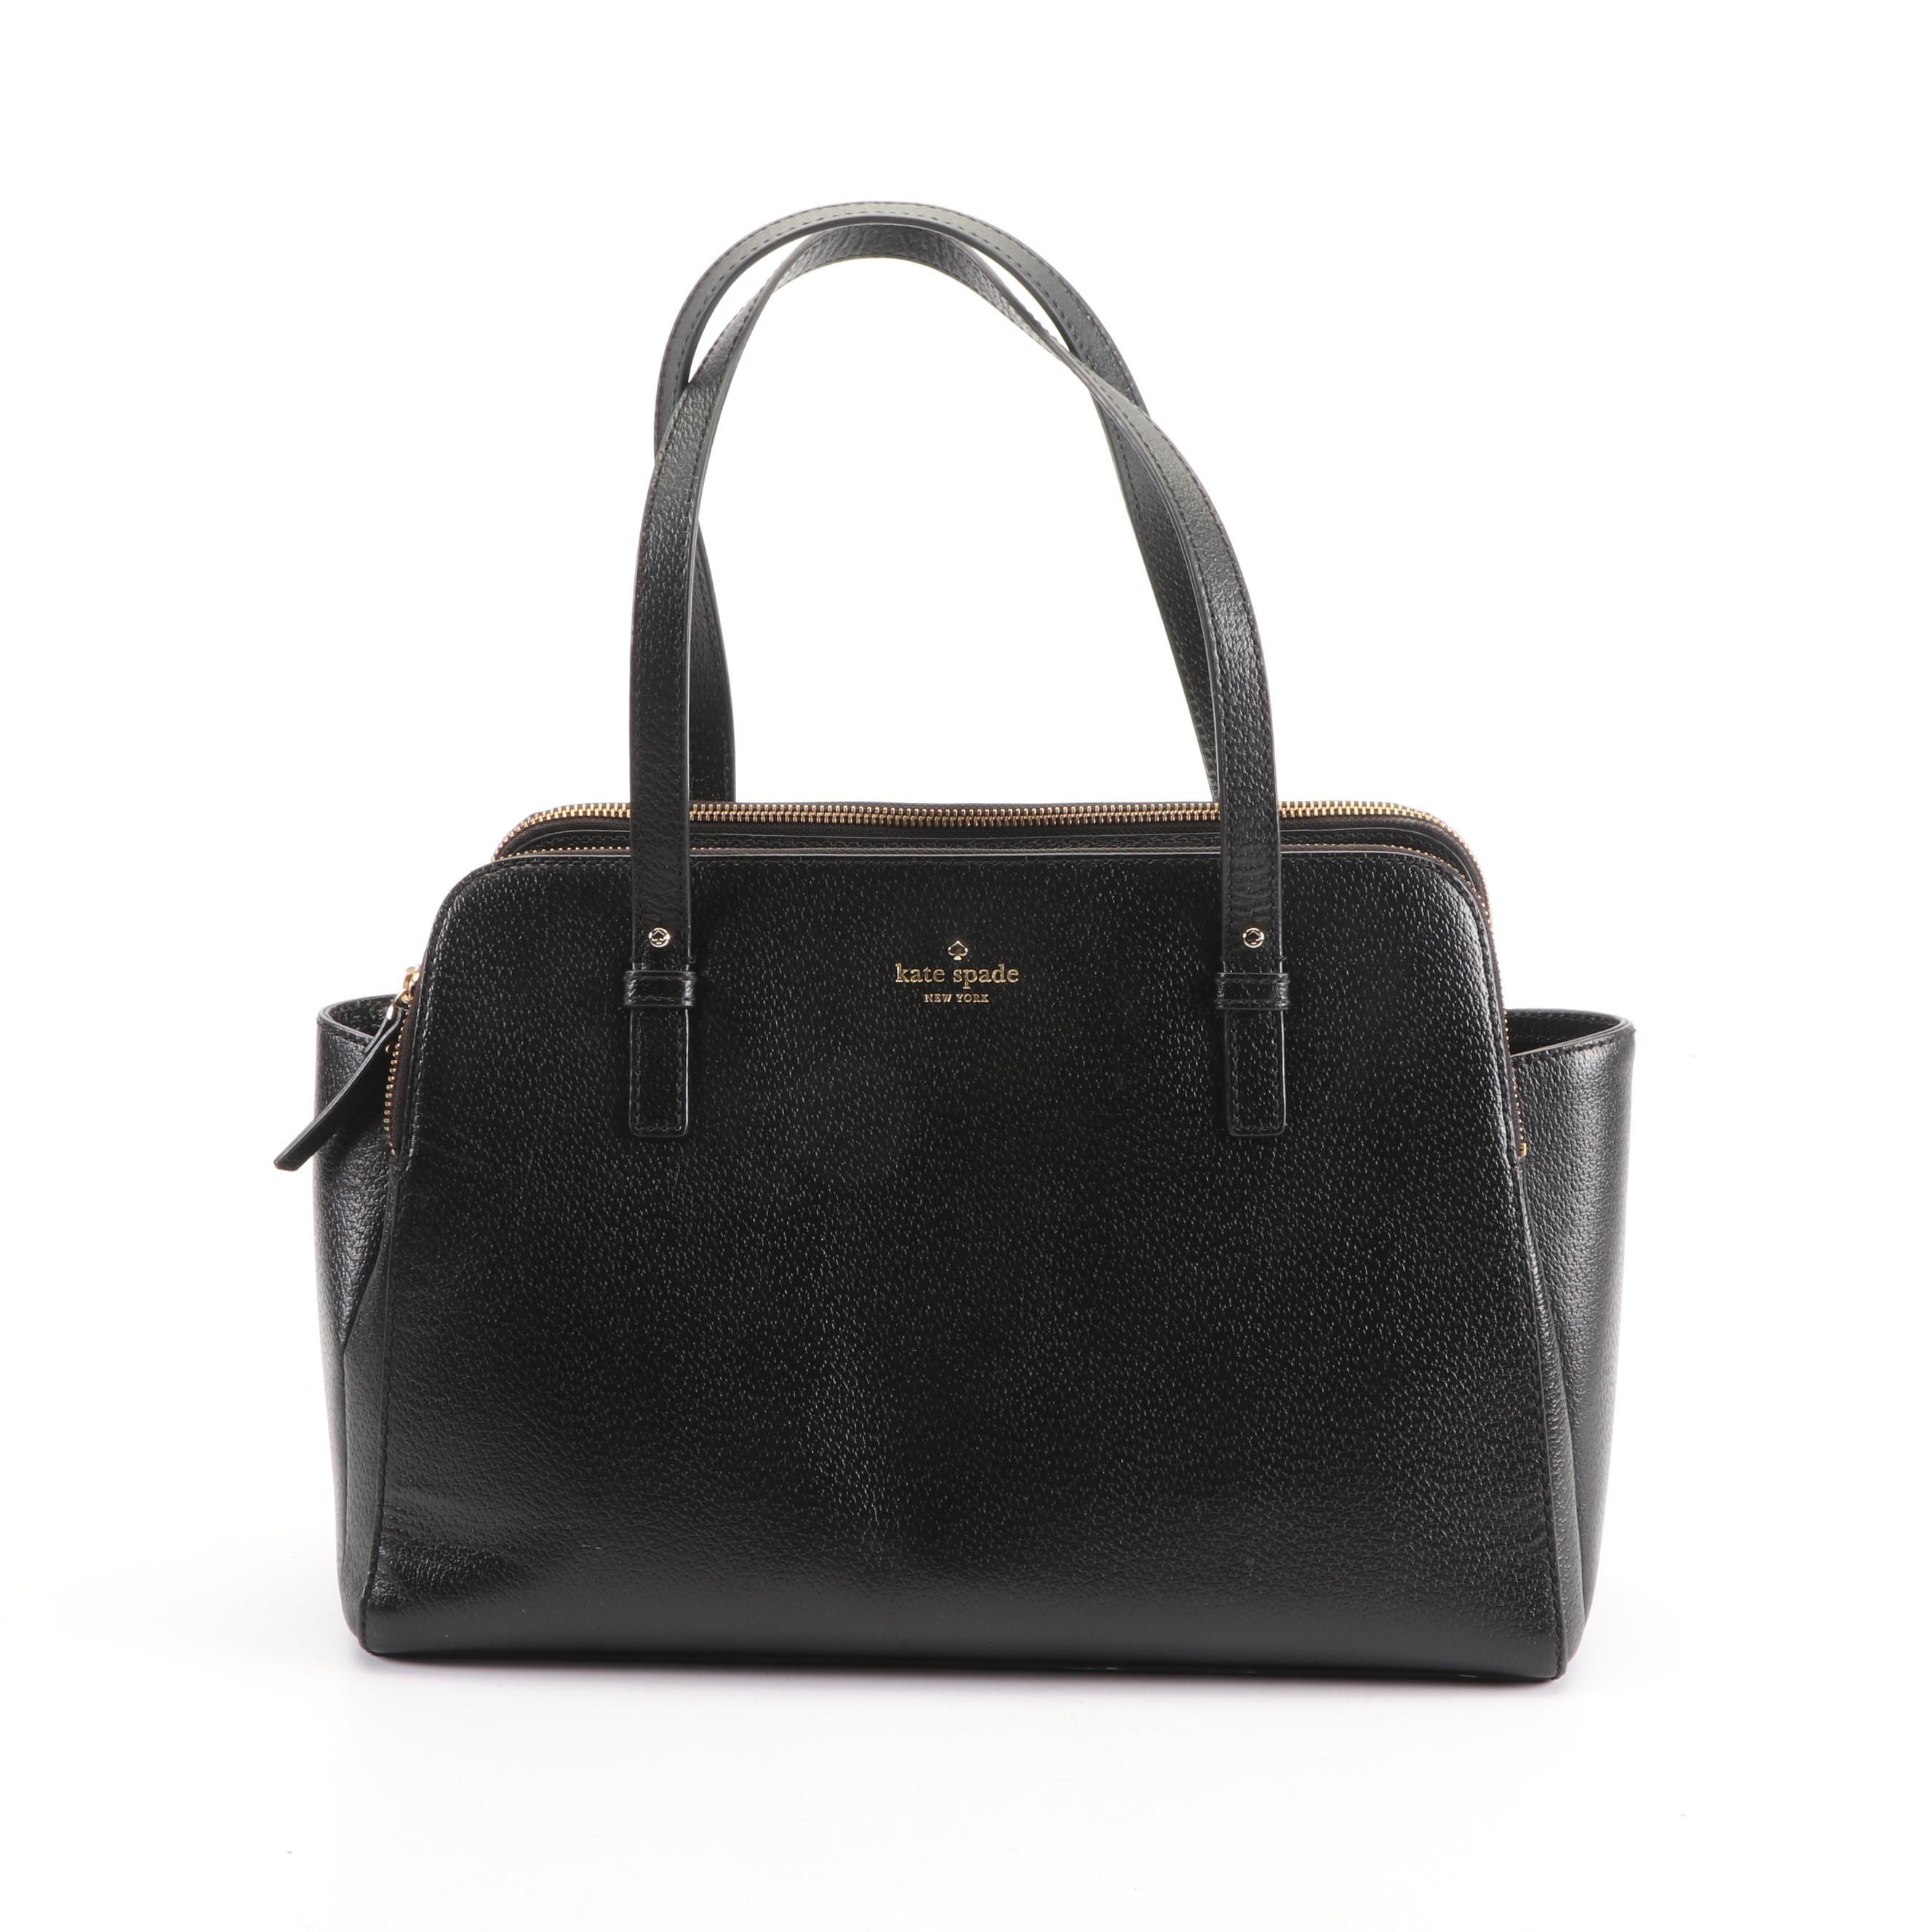 Kate Spade New York Black Leather Satchel